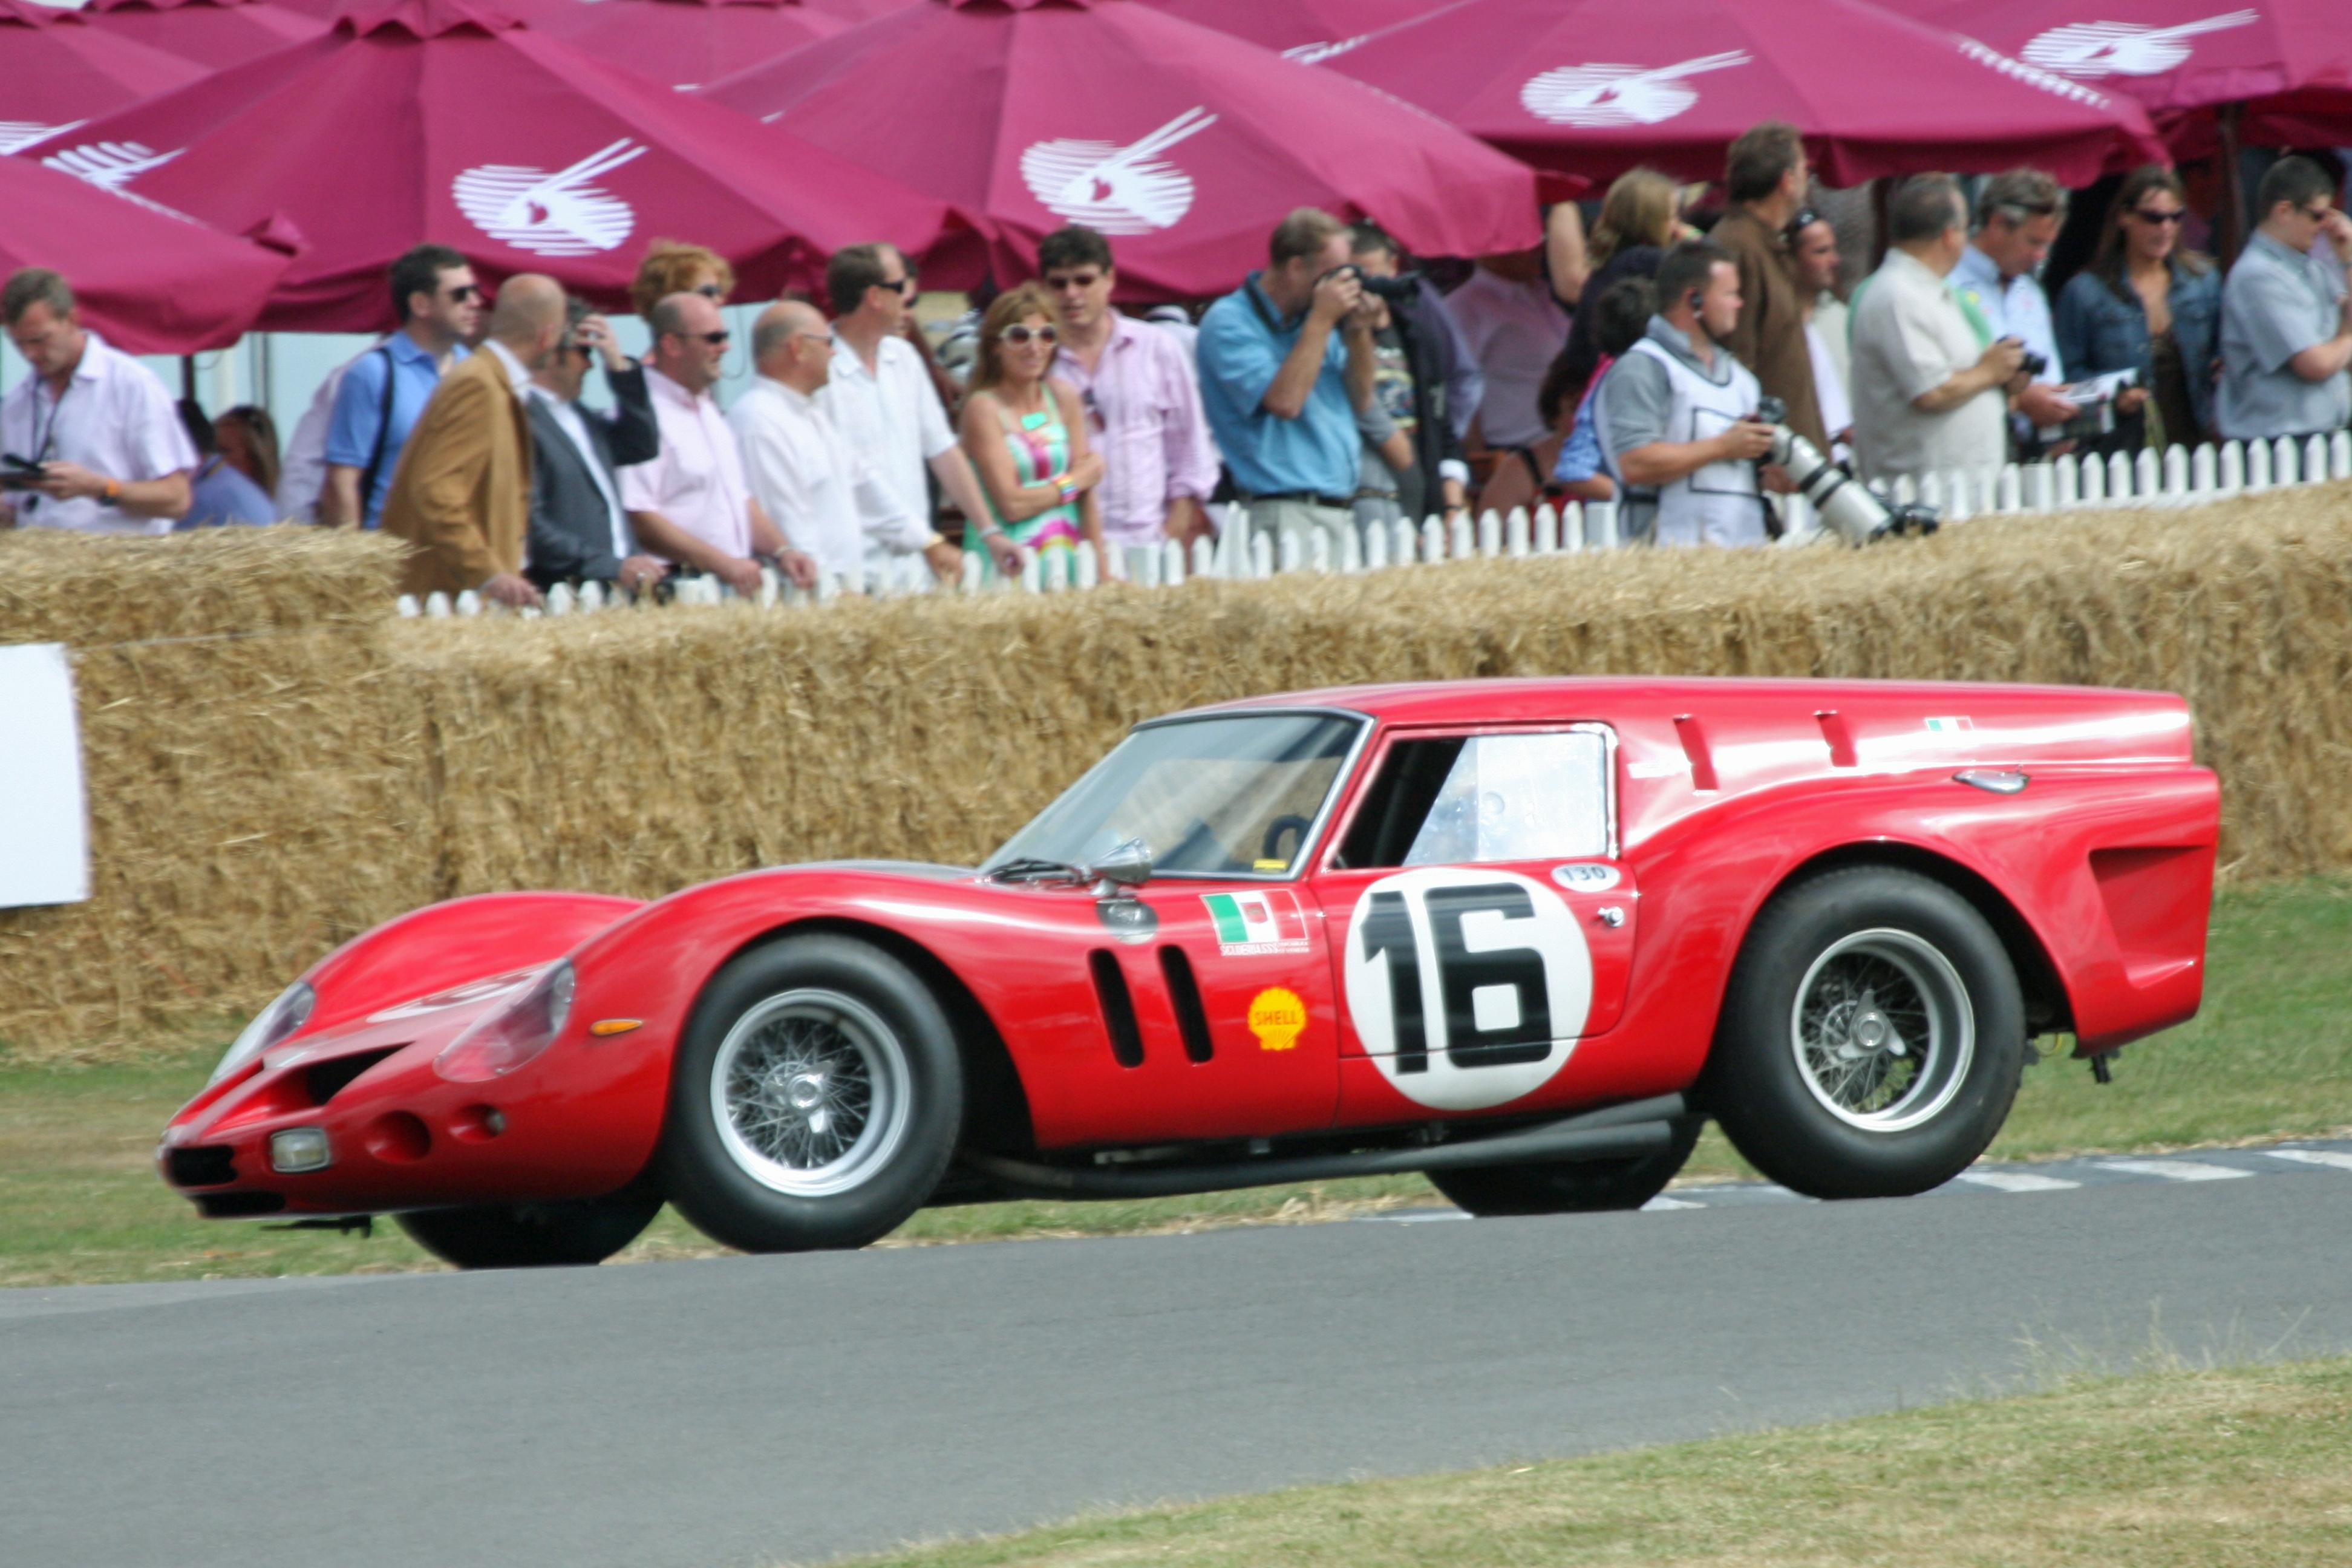 1961_Ferrari_250GT_SWB_%27Breadvan%27.jpg